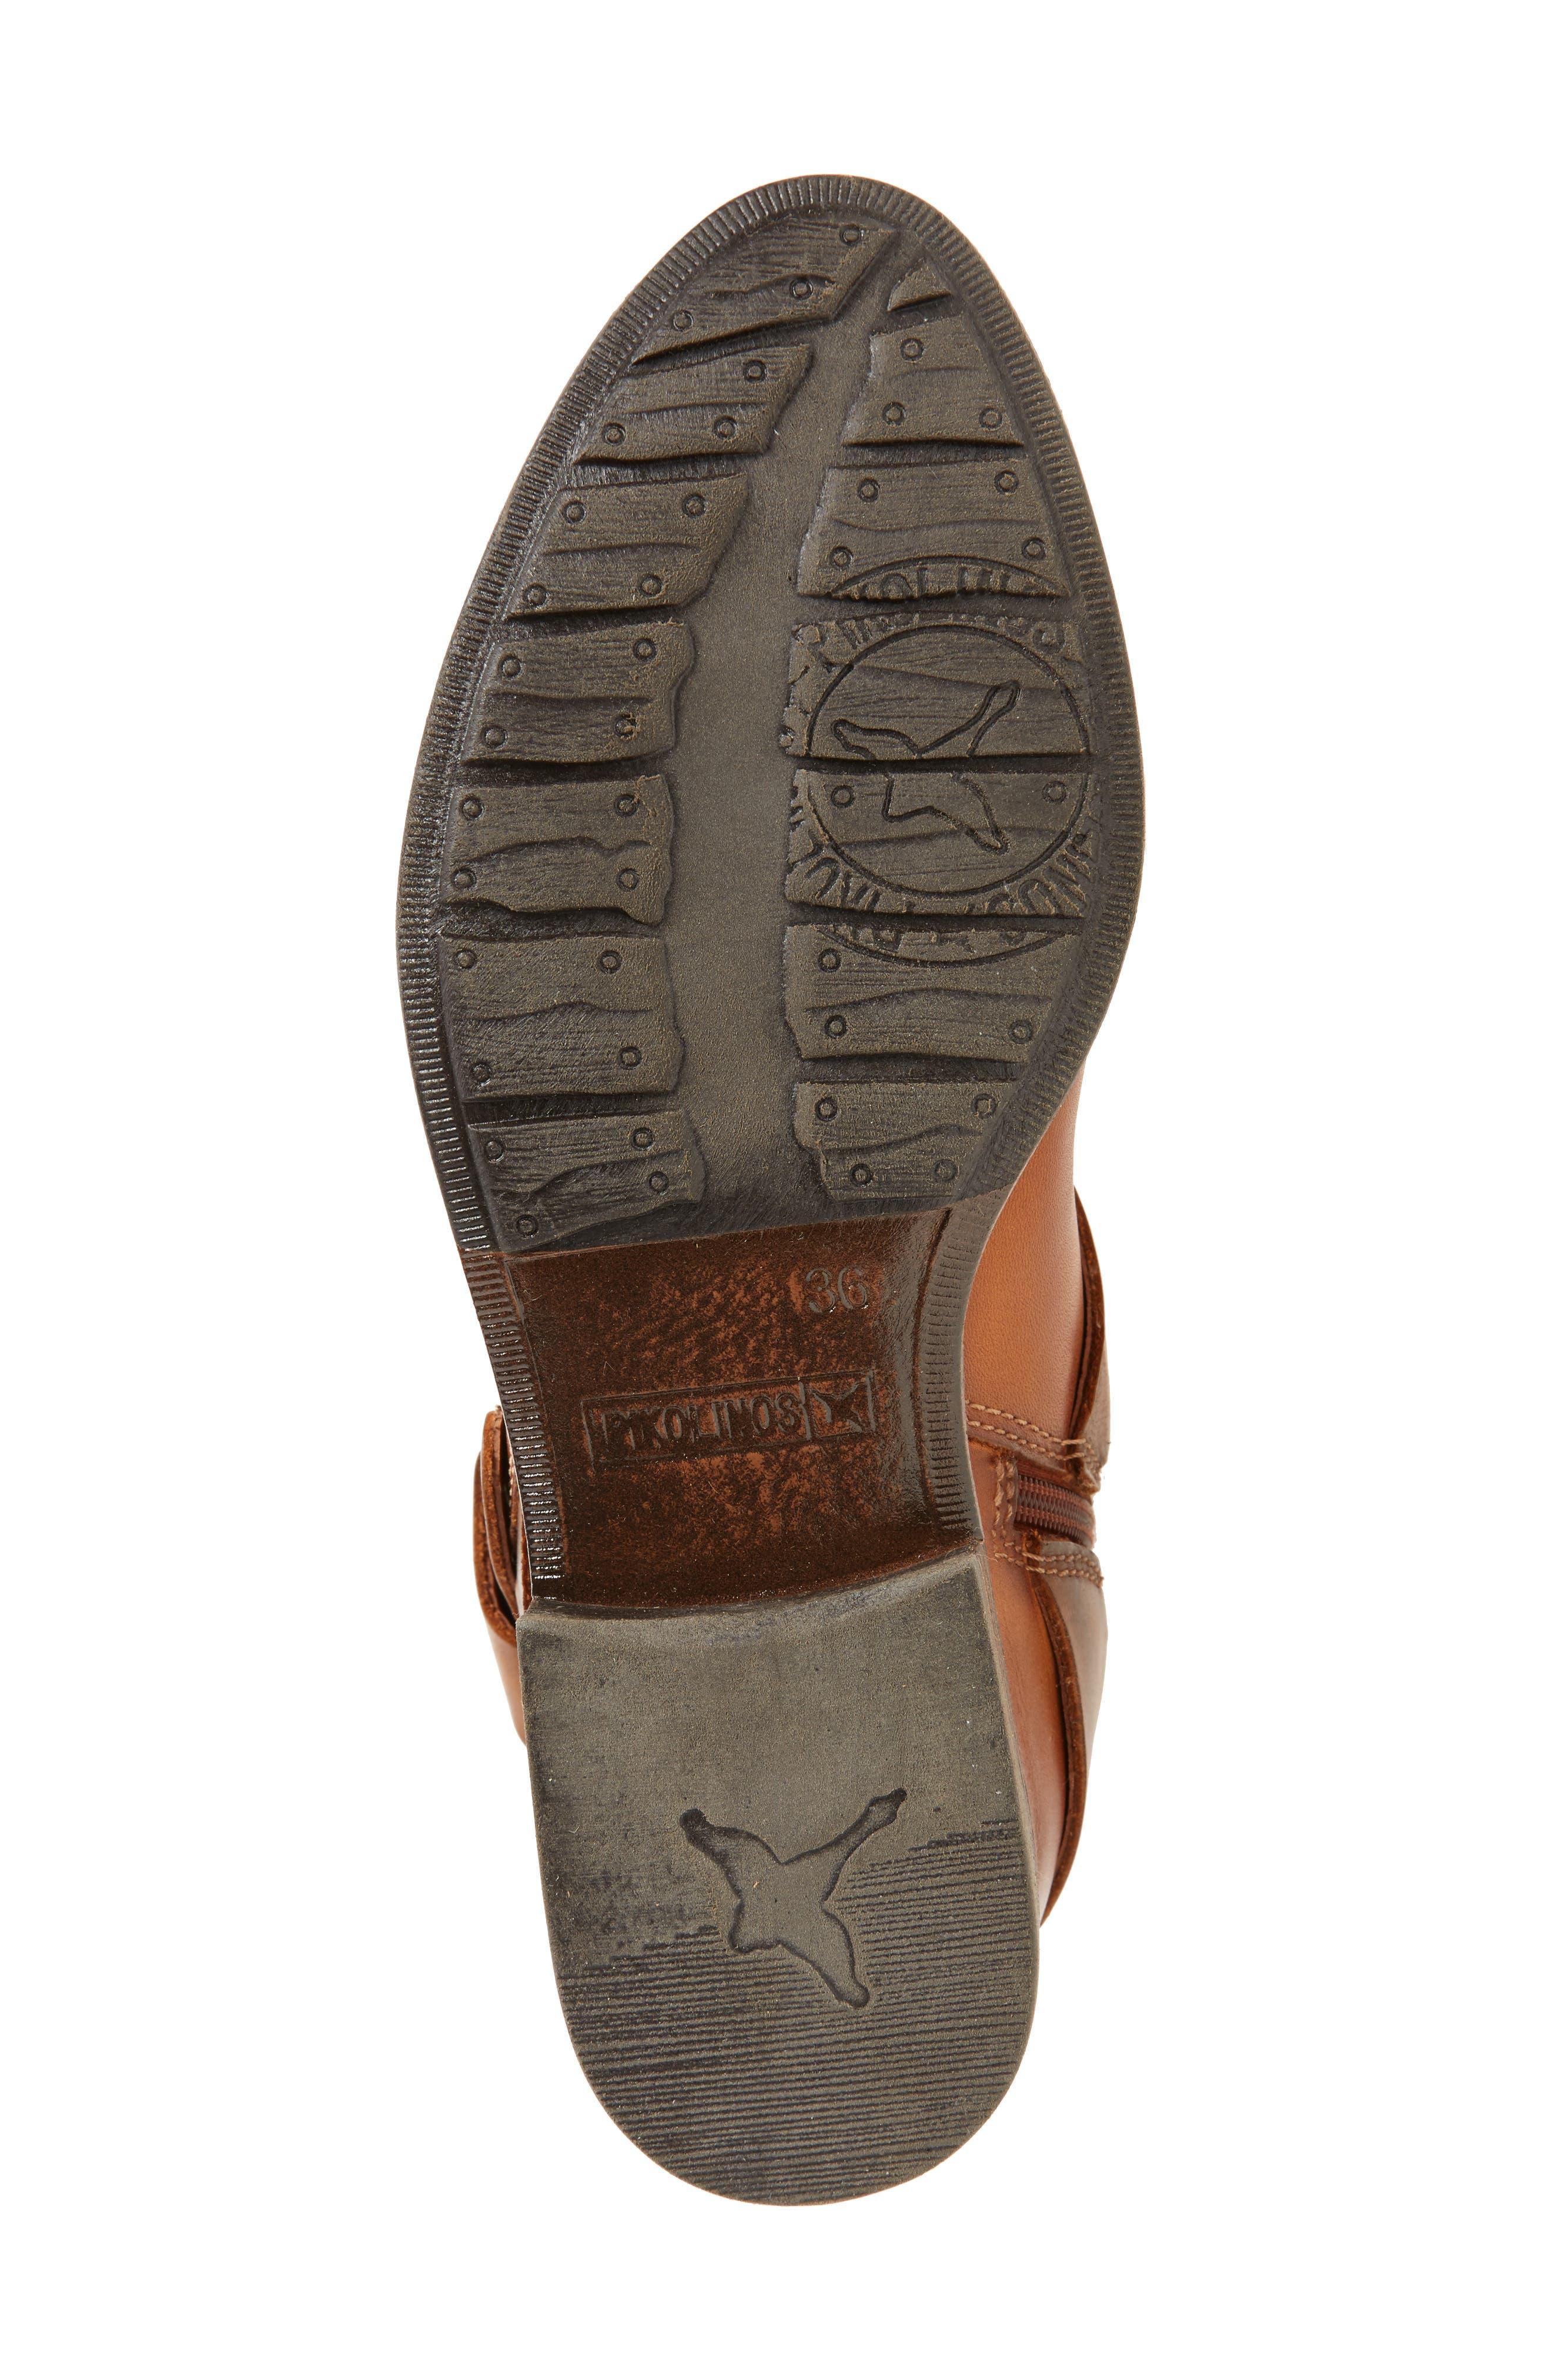 Ordino Knee High Boot,                             Alternate thumbnail 6, color,                             Brandy Cuero Leather